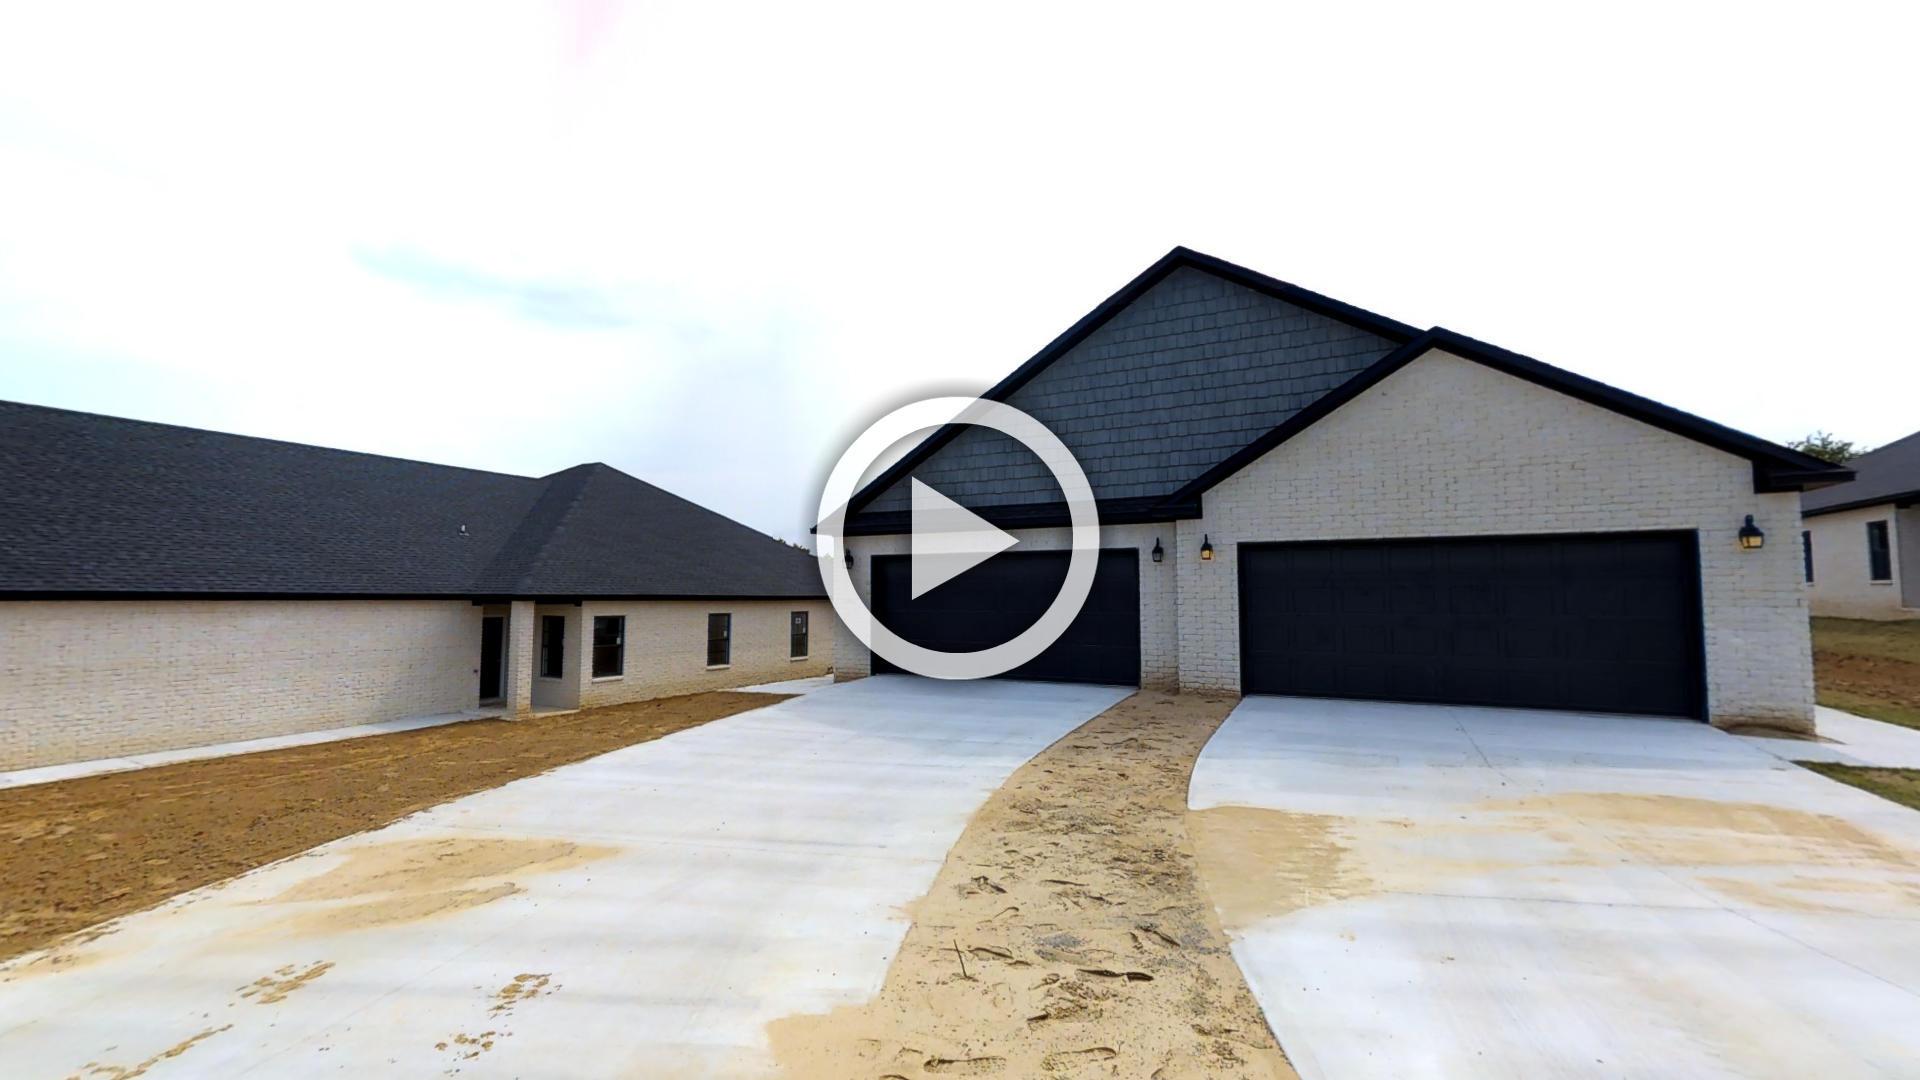 3 Bedroom Single Story Duplex Arkansas Inspection Group